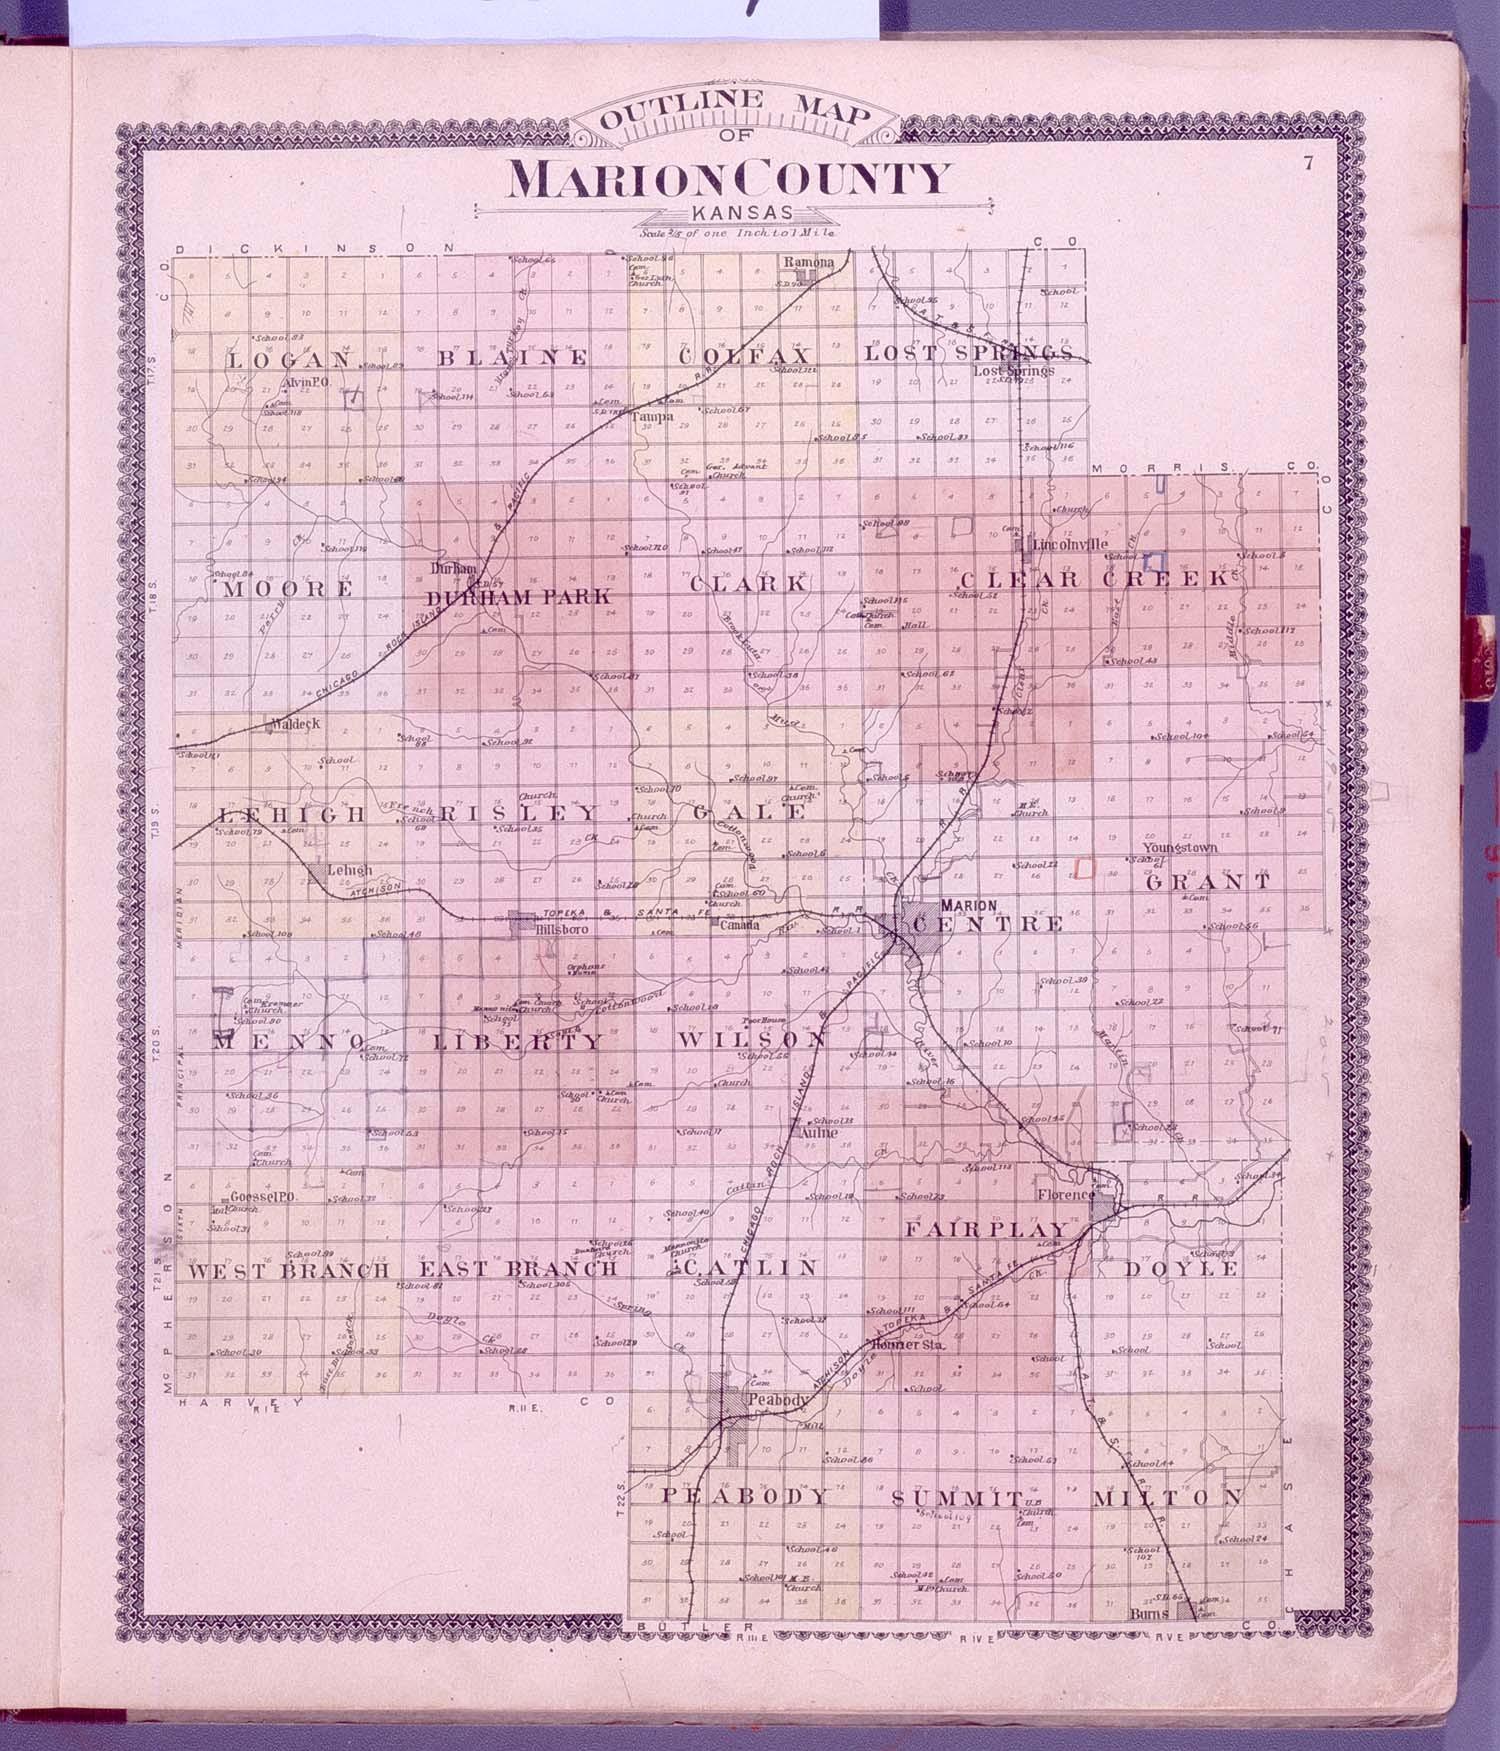 Standard atlas of Marion County, Kansas - 7